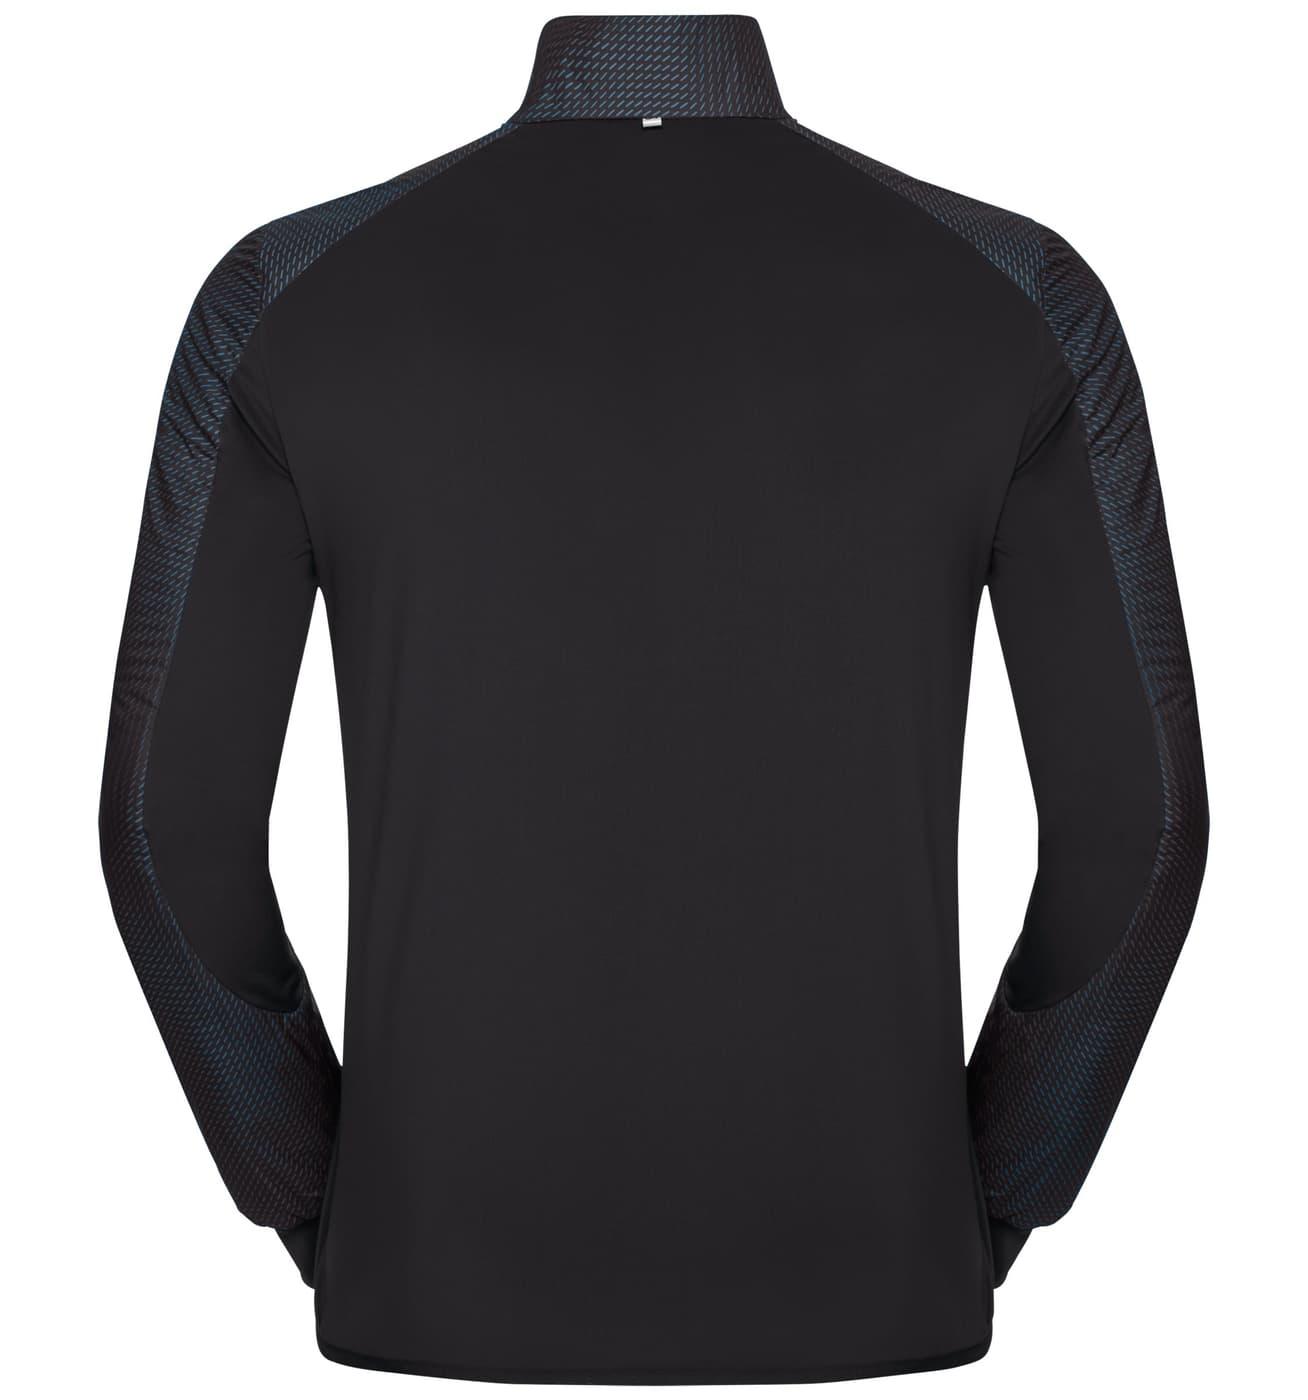 Jacket Jacket Jacket Veste Pour Irbis Odlo Warm Homme X Migros Migros Migros q4FTt